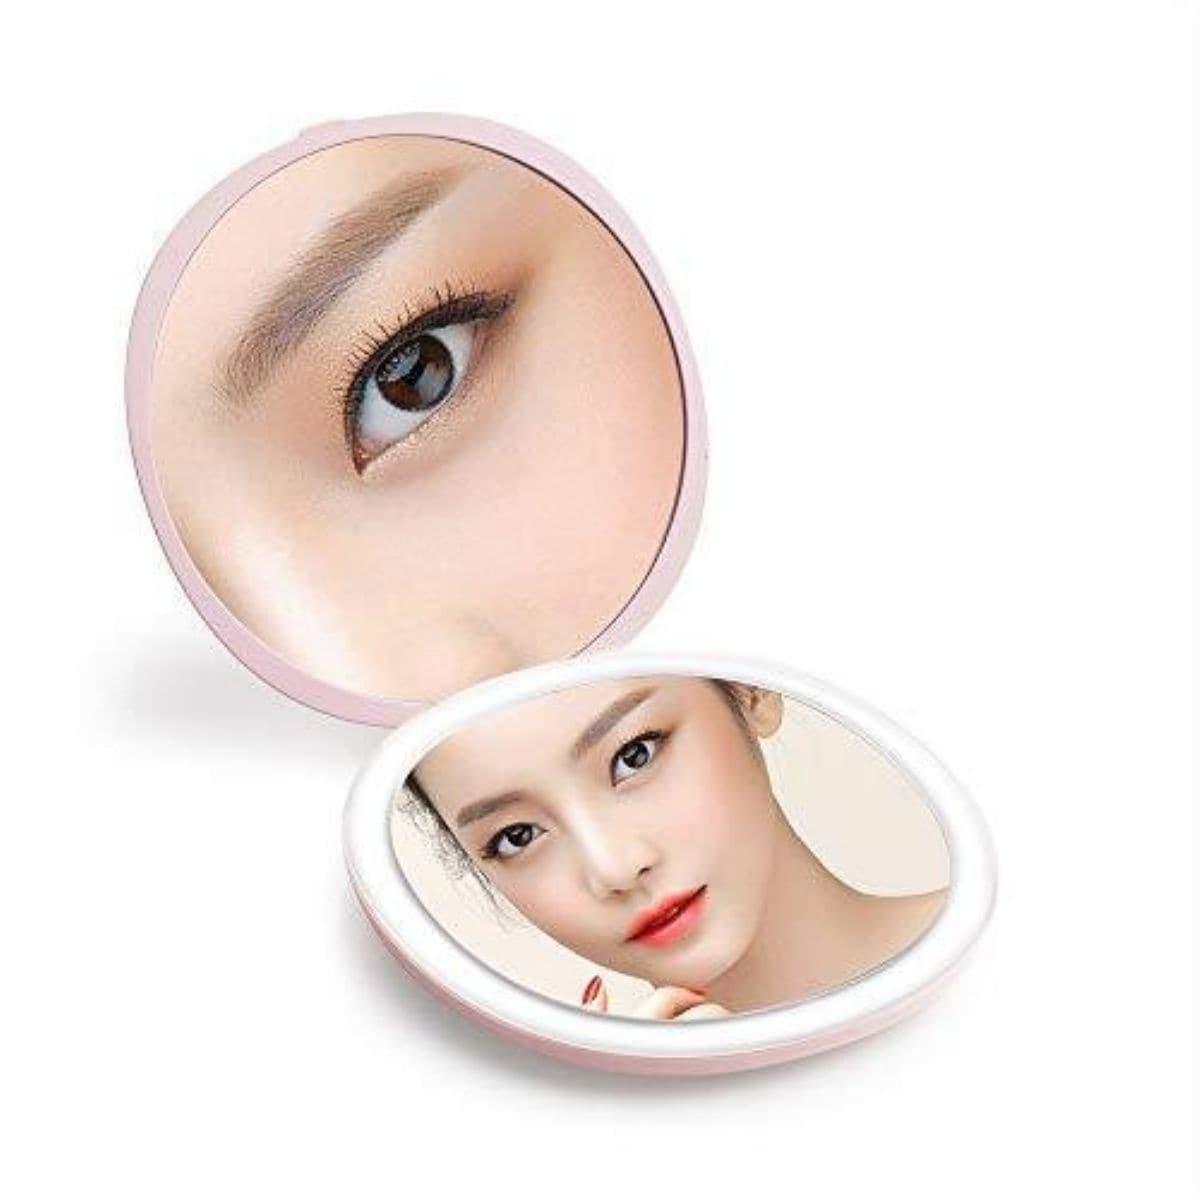 Mysmir コンパクトLEDミラー 手鏡 在庫あり 携帯 折り畳み式鏡 出色 化粧鏡 わくわくファイネスト 両面ミラー 折りたたみ 旅行ミラー